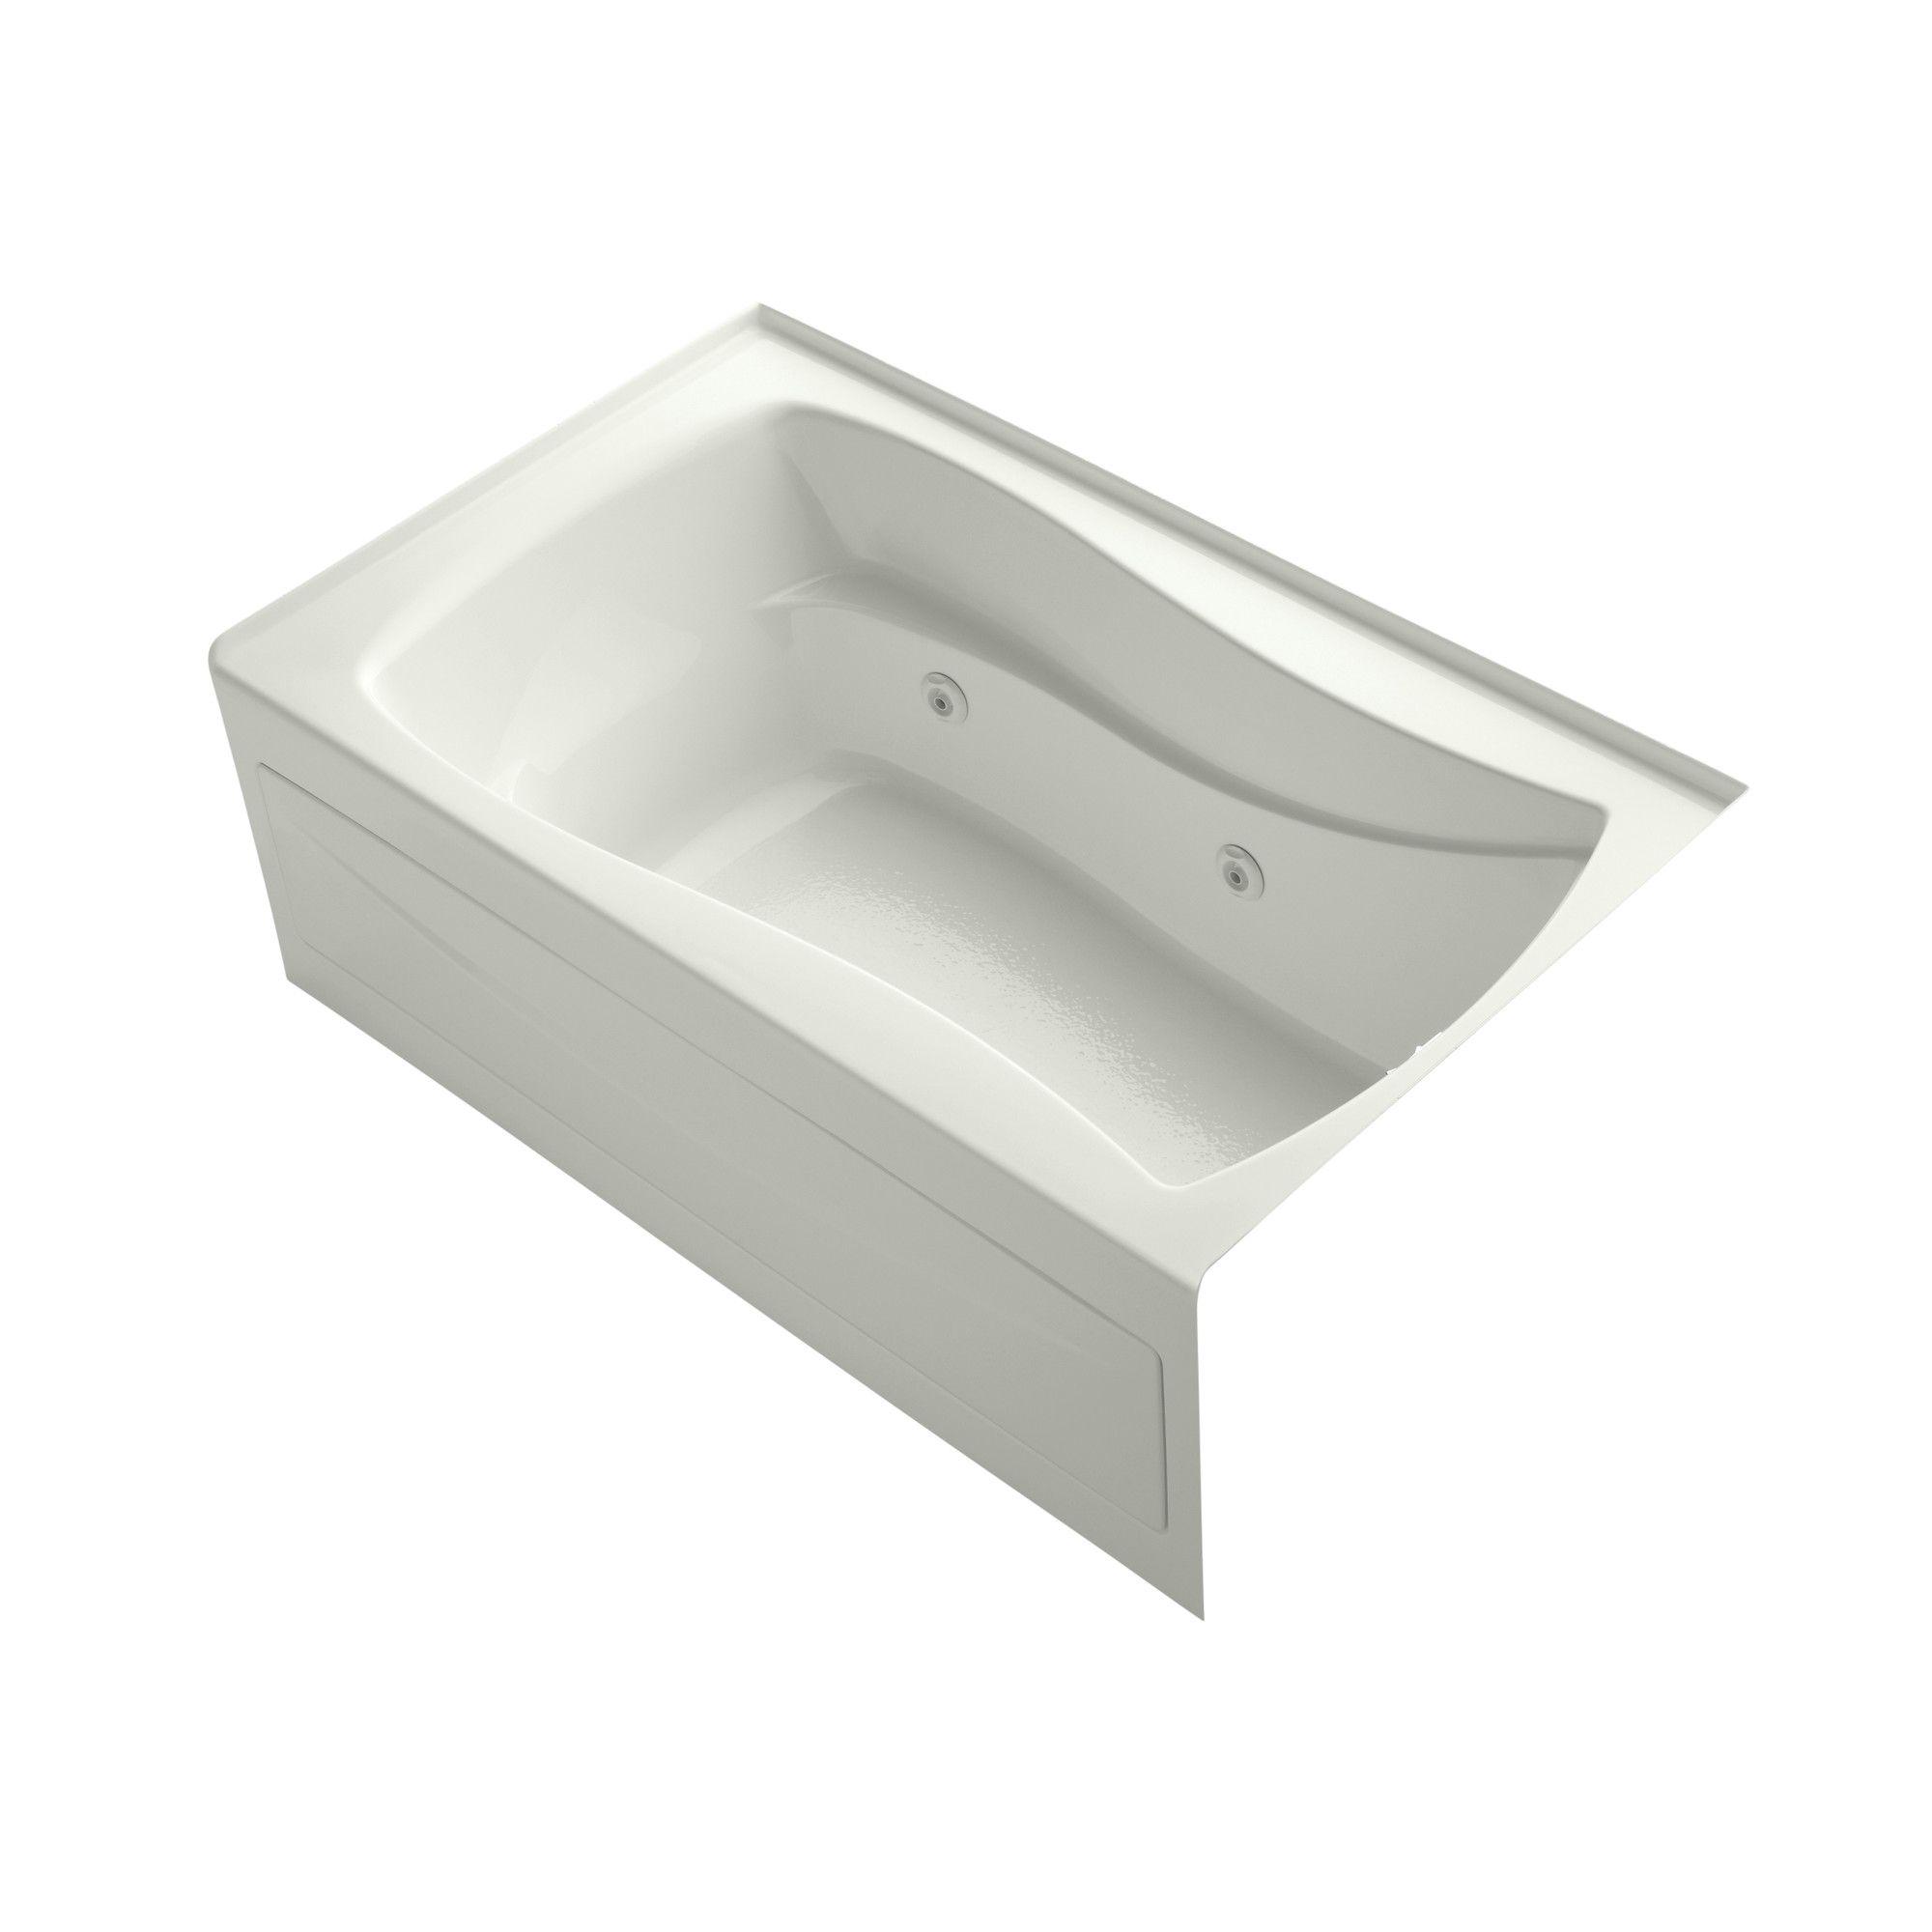 "Mariposa Alcove 60"" x 36"" Whirpool Bathtub"